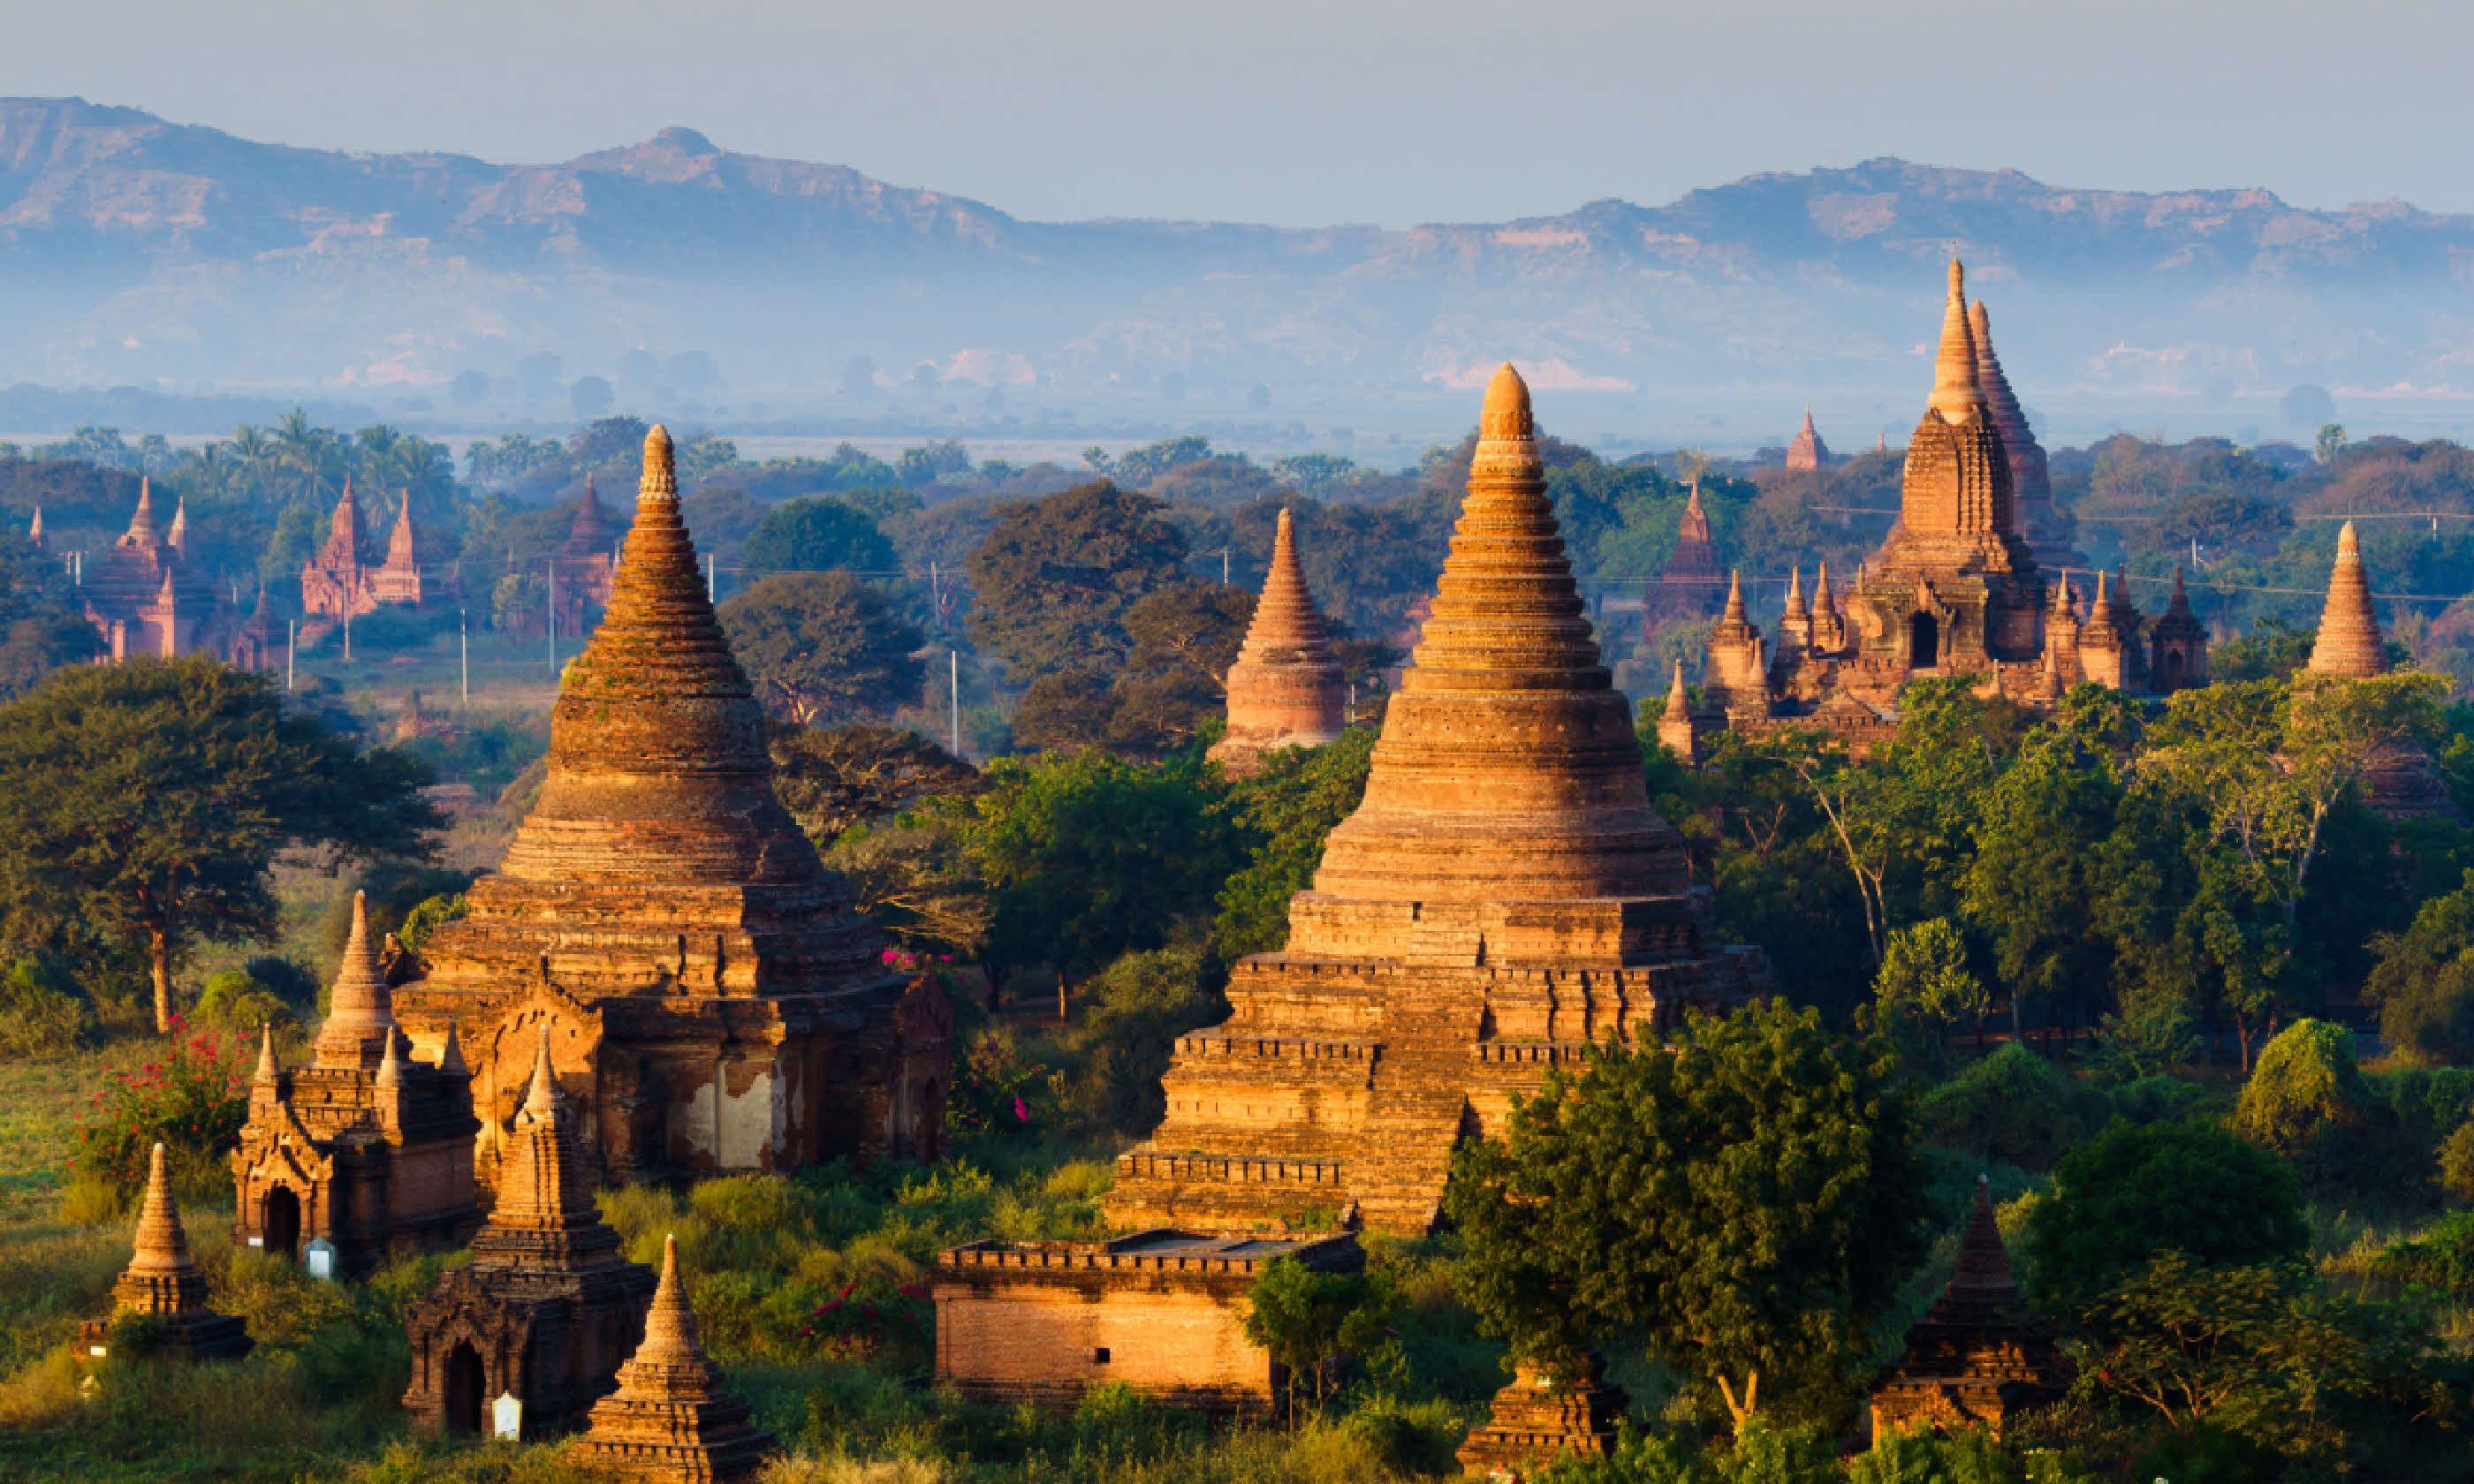 Mandalay (Shutterstock)